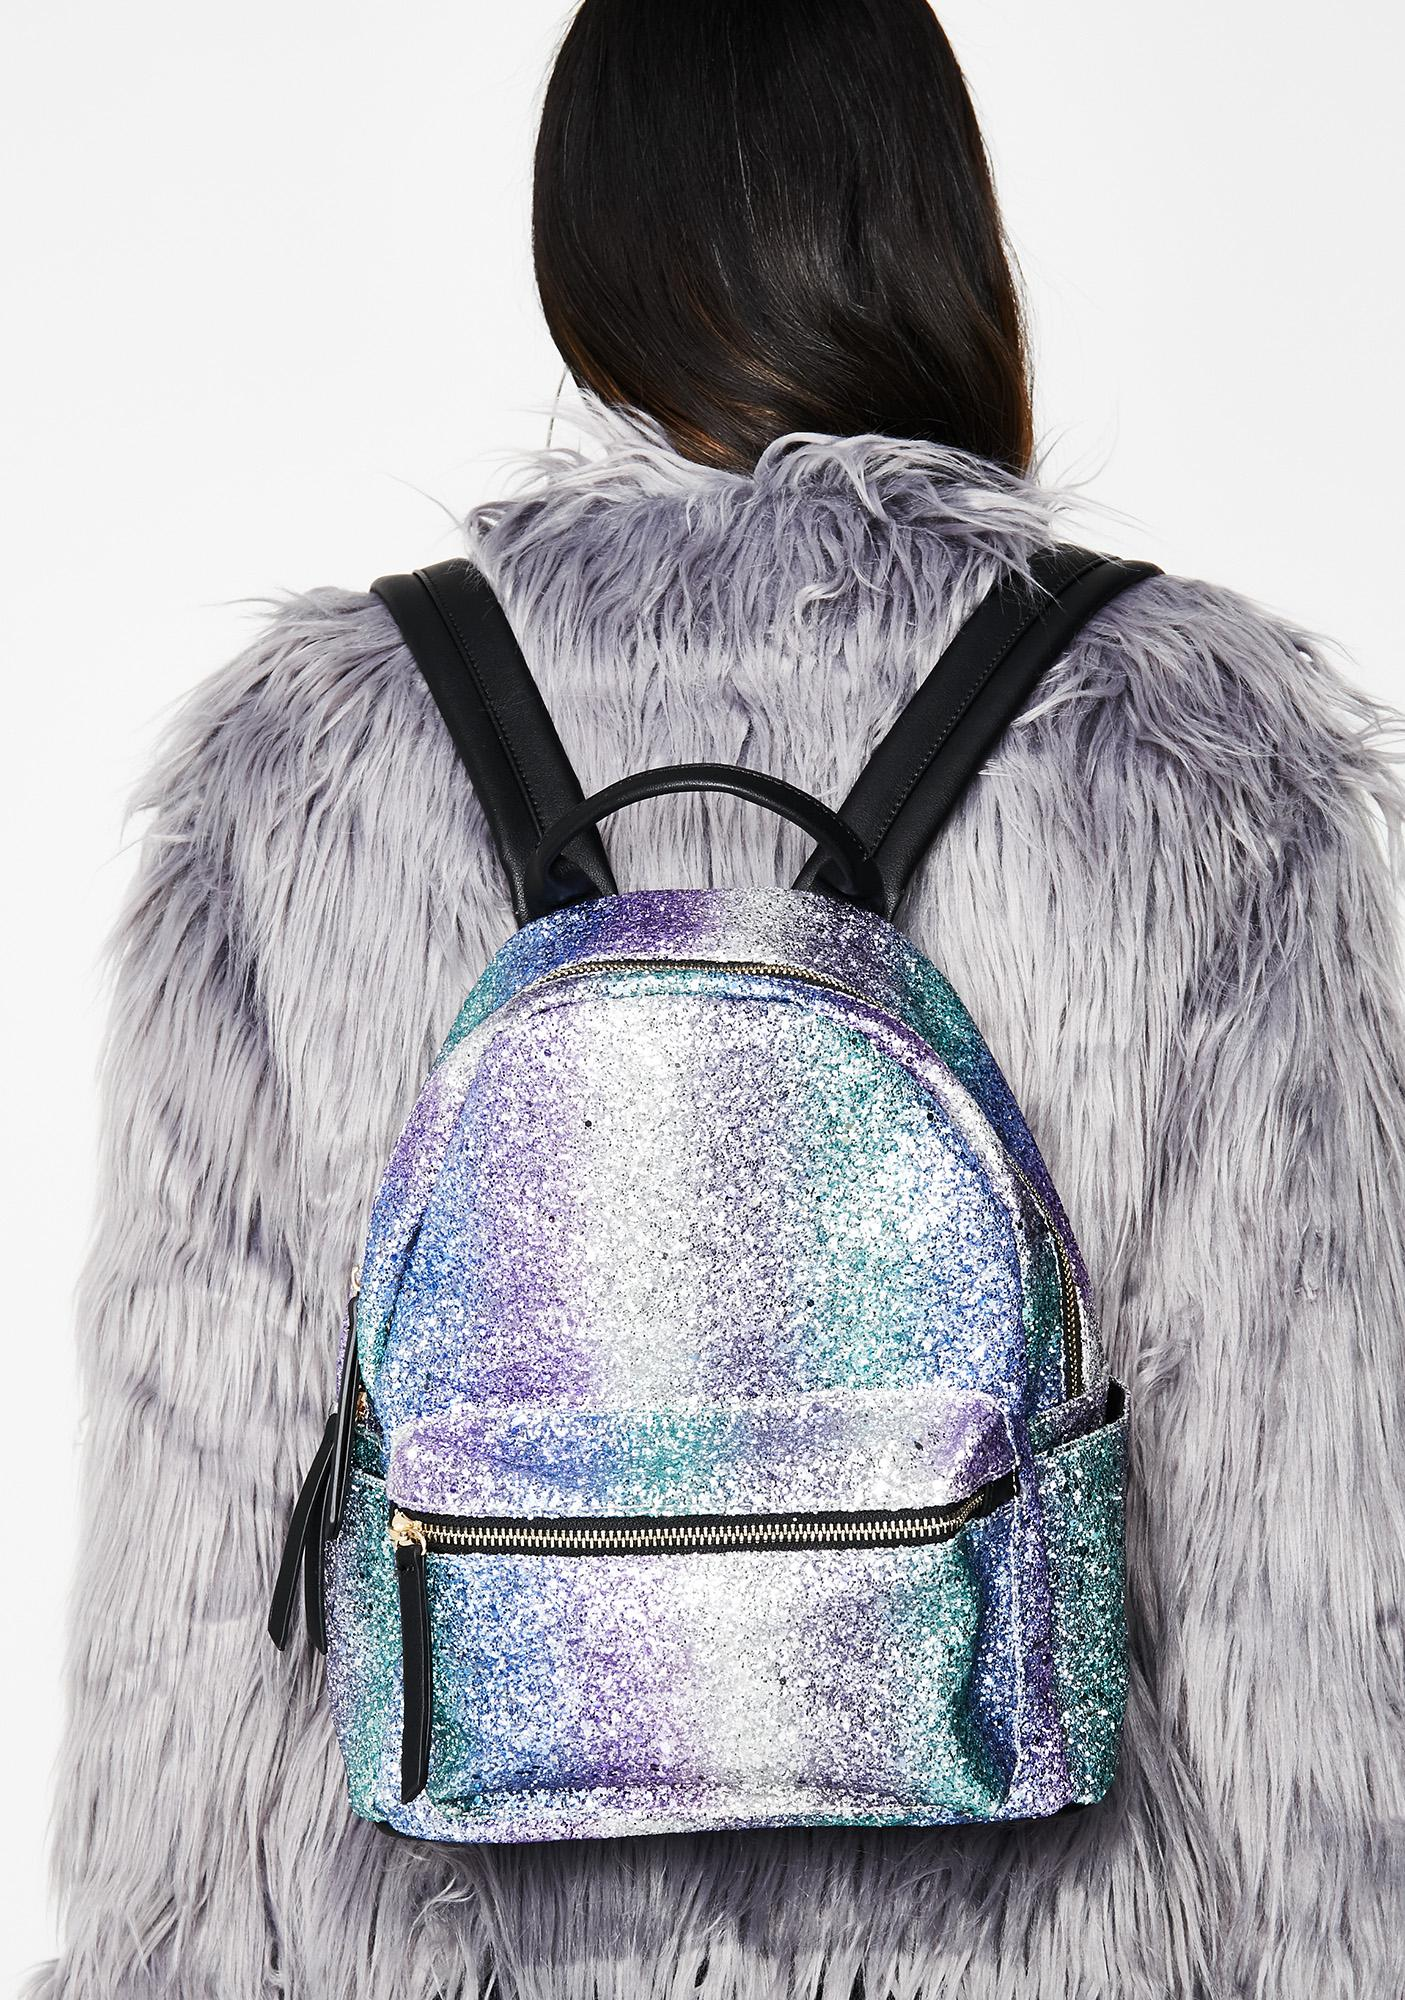 Glitter Other Worldly Backpack